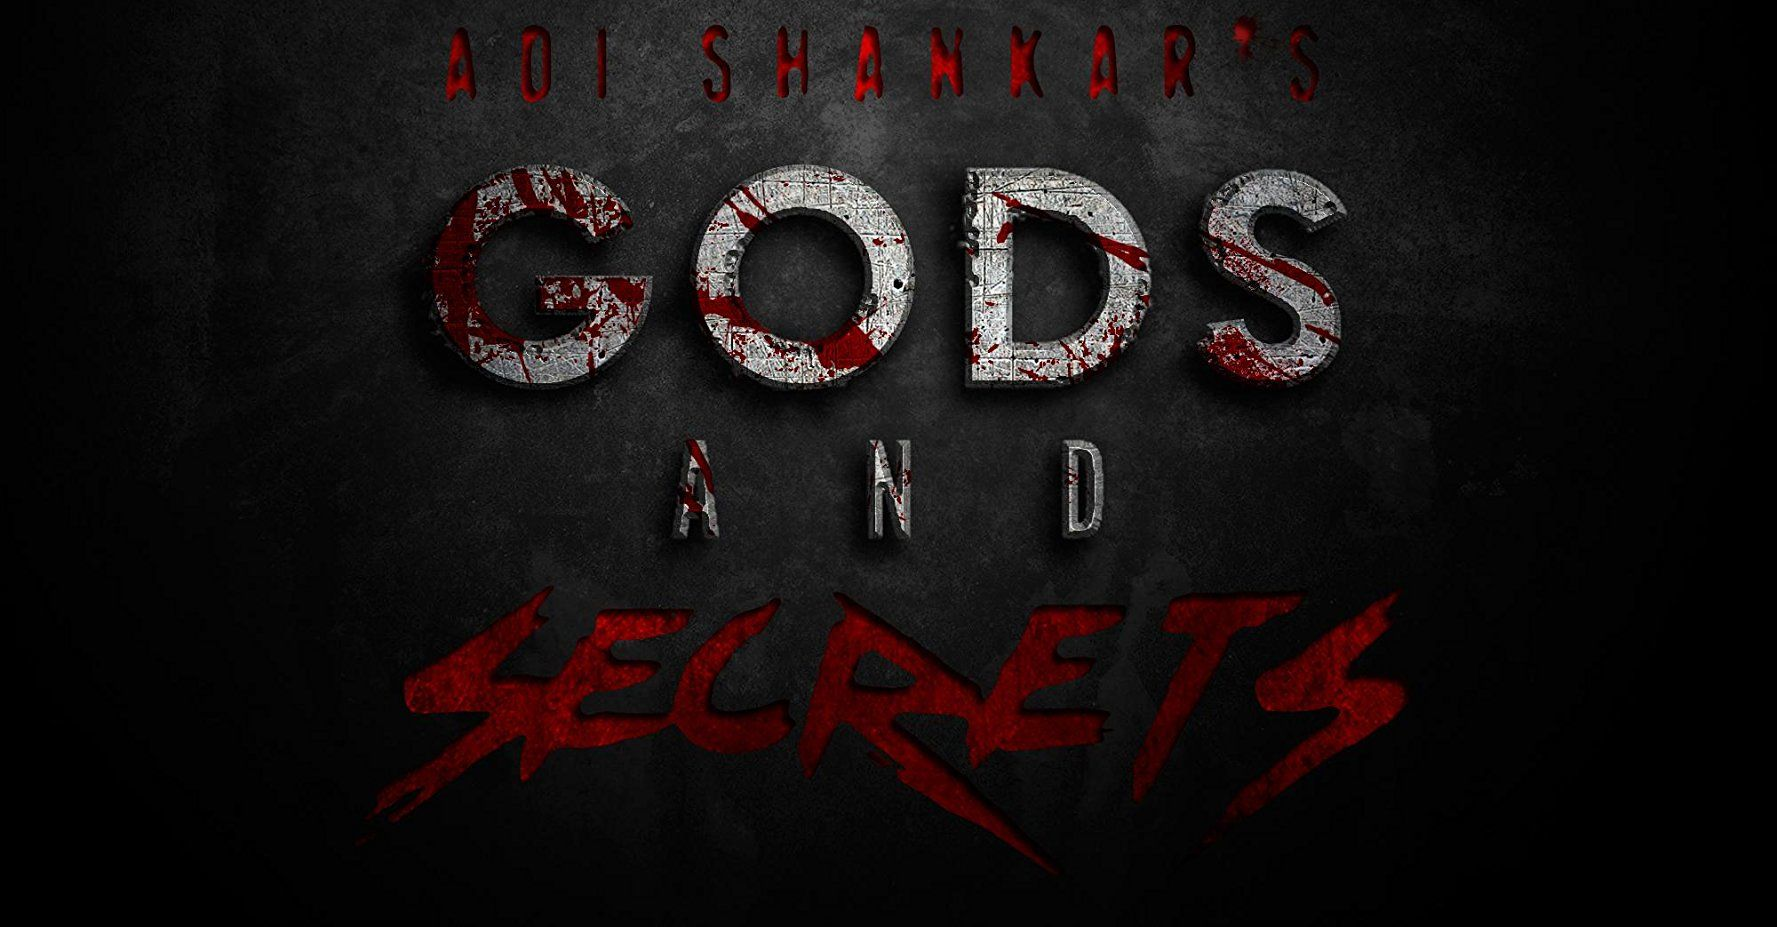 Adi Shankar's Gods and Secrets cover